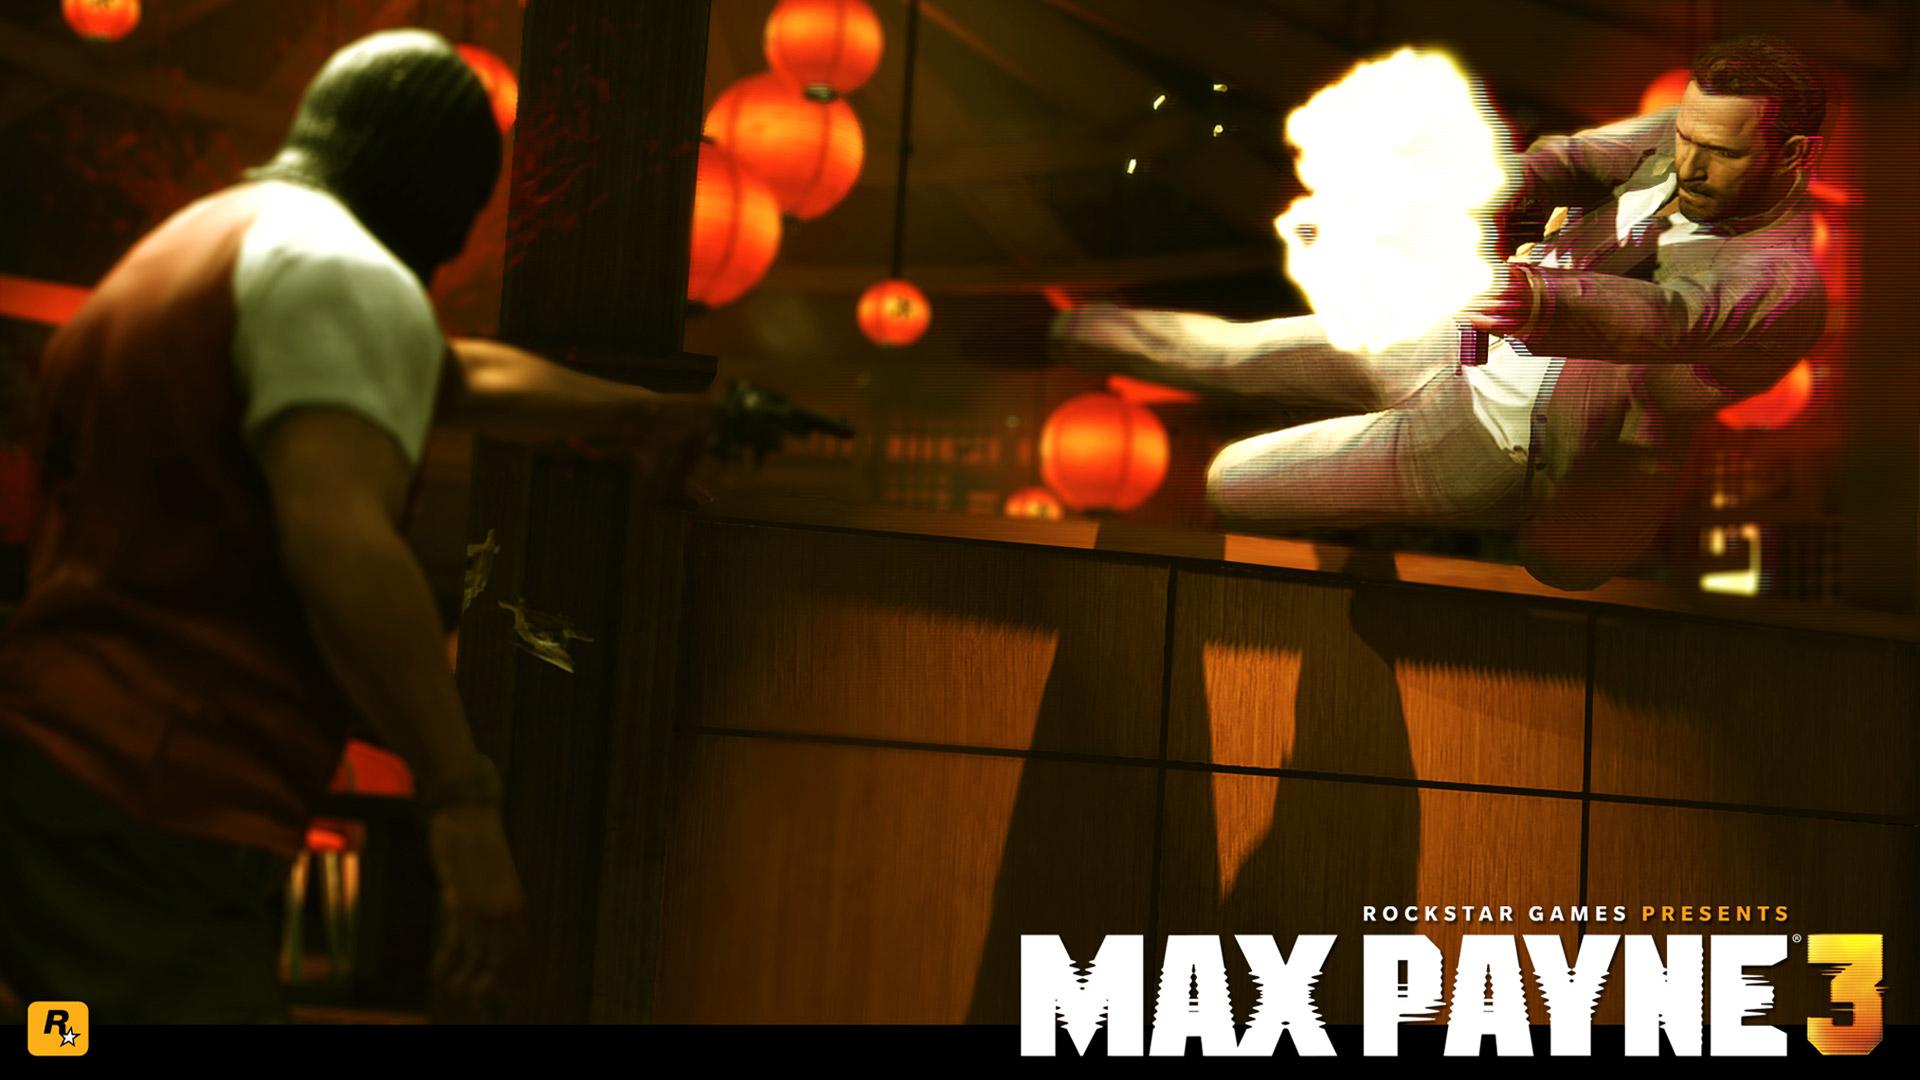 Free Max Payne 3 Wallpaper in 1920x1080